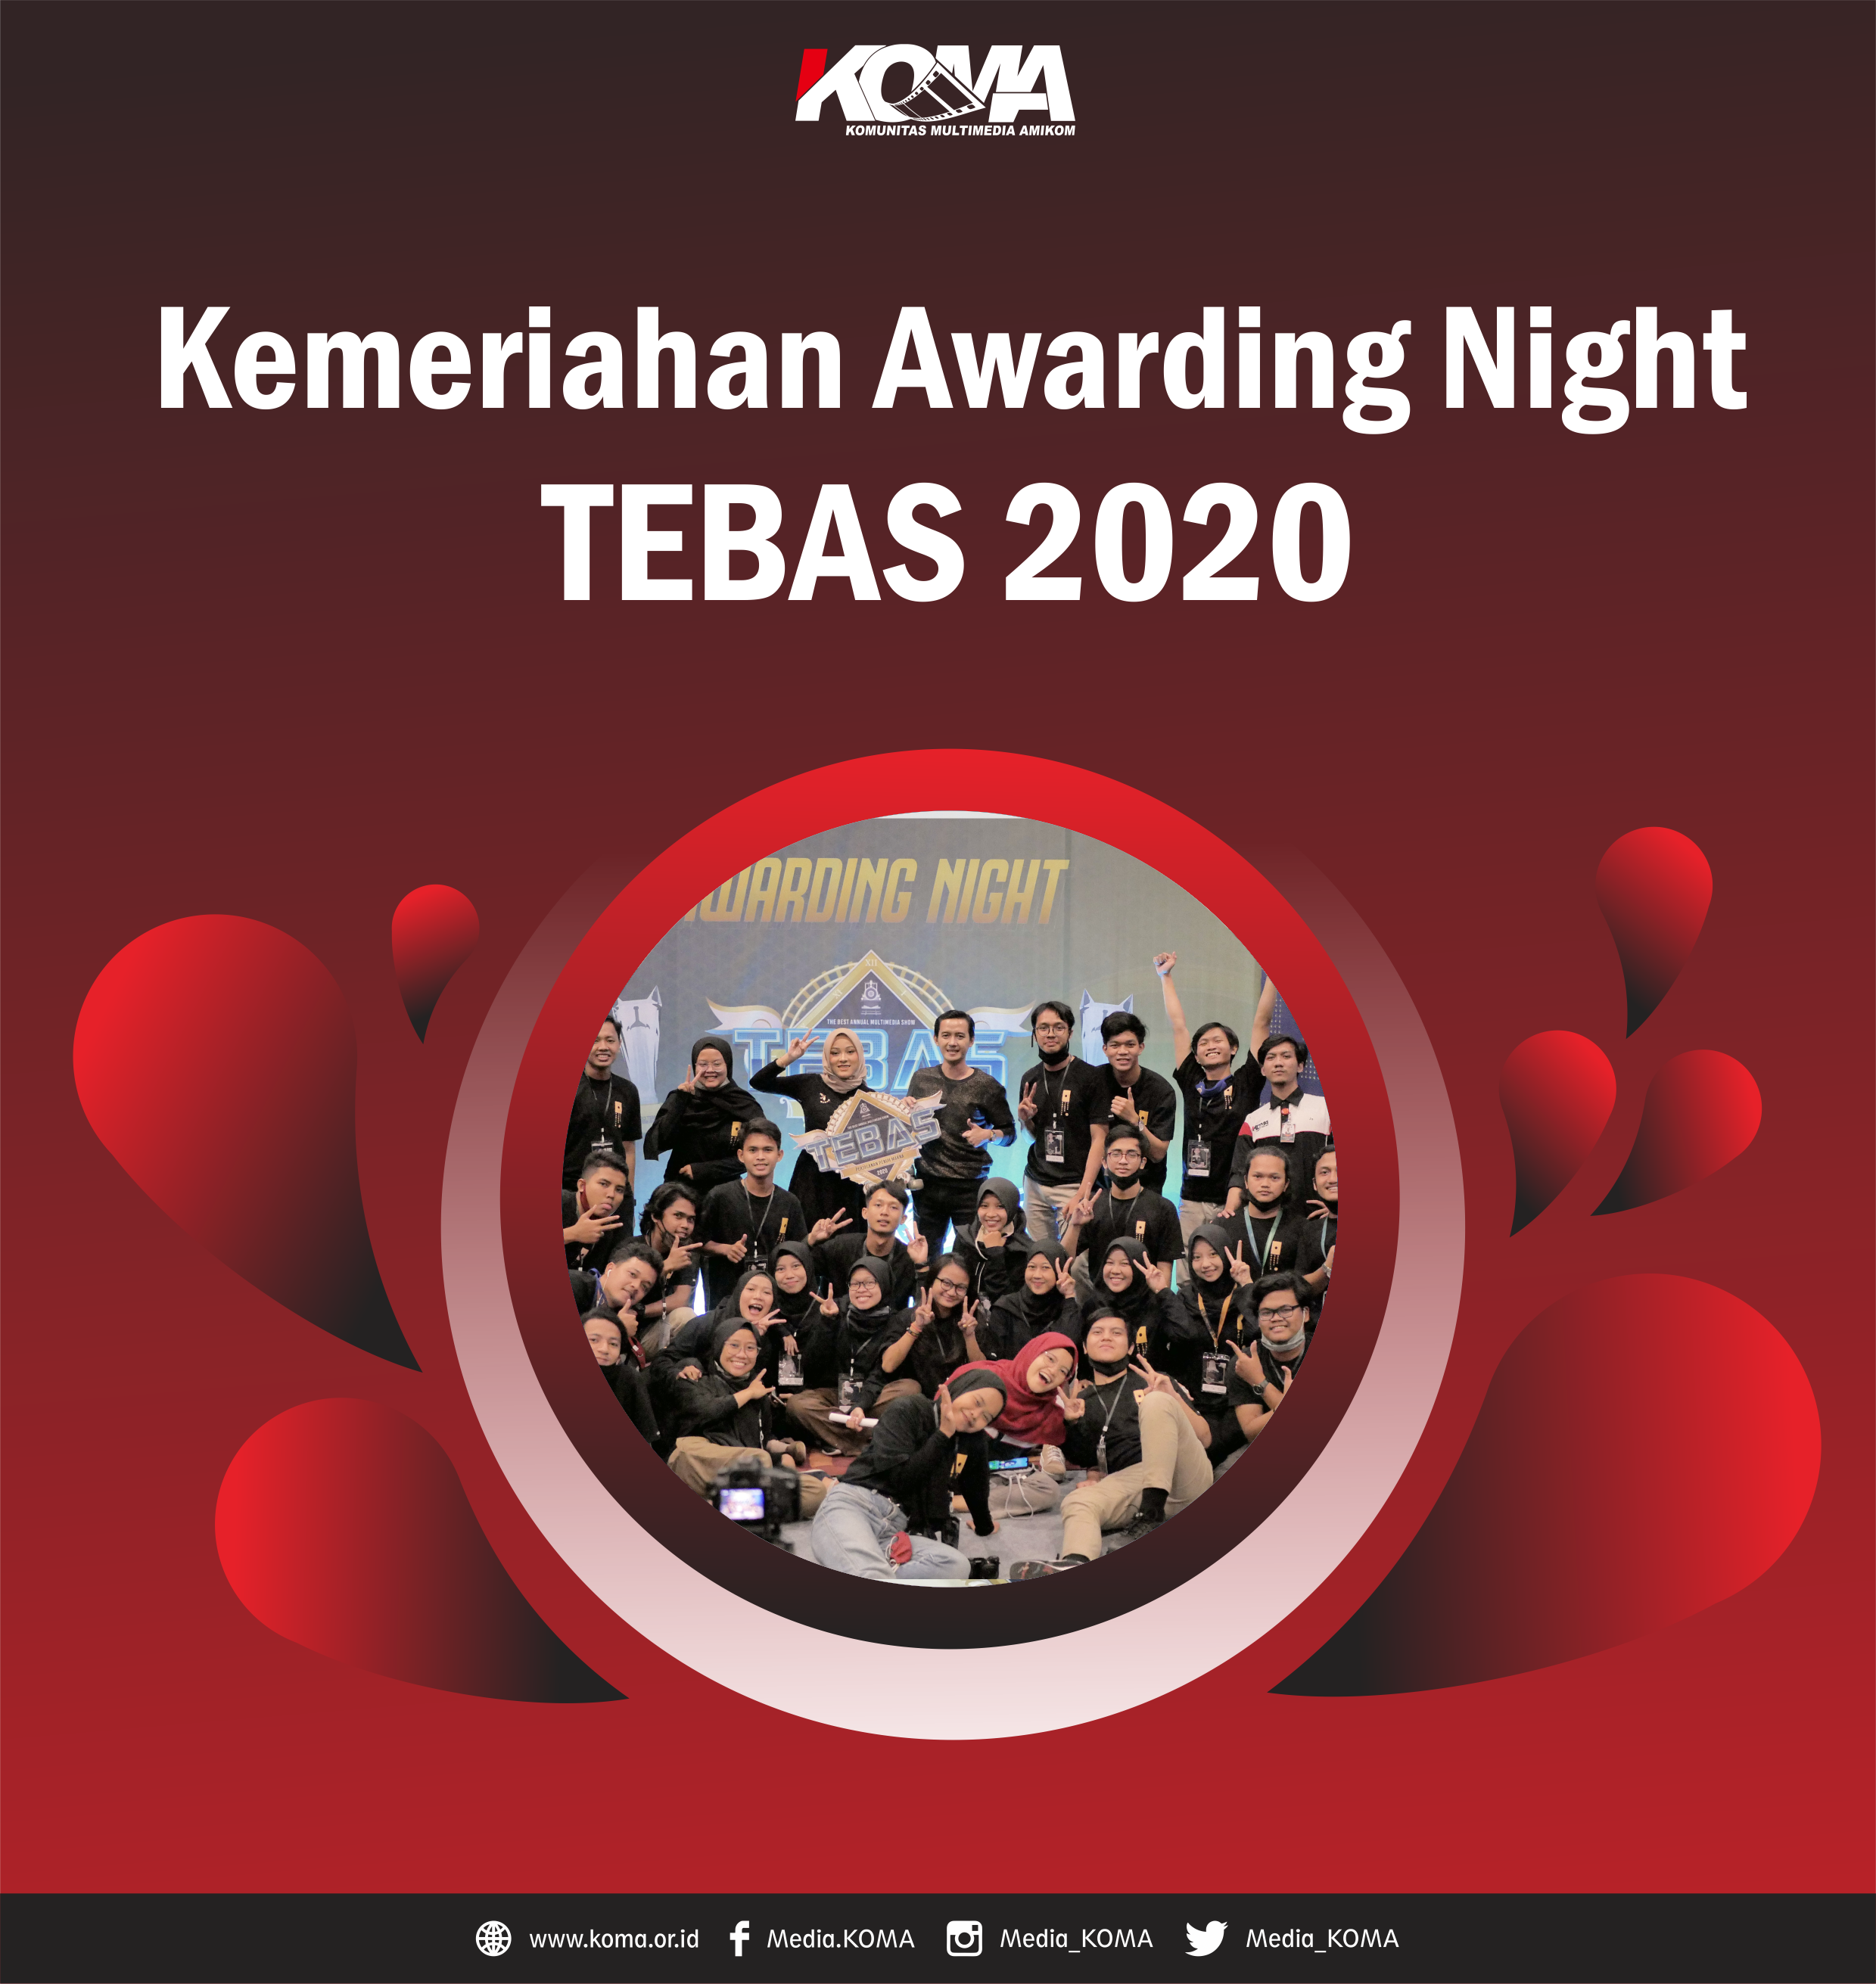 Kemeriahan Awarding Night TEBAS 2020